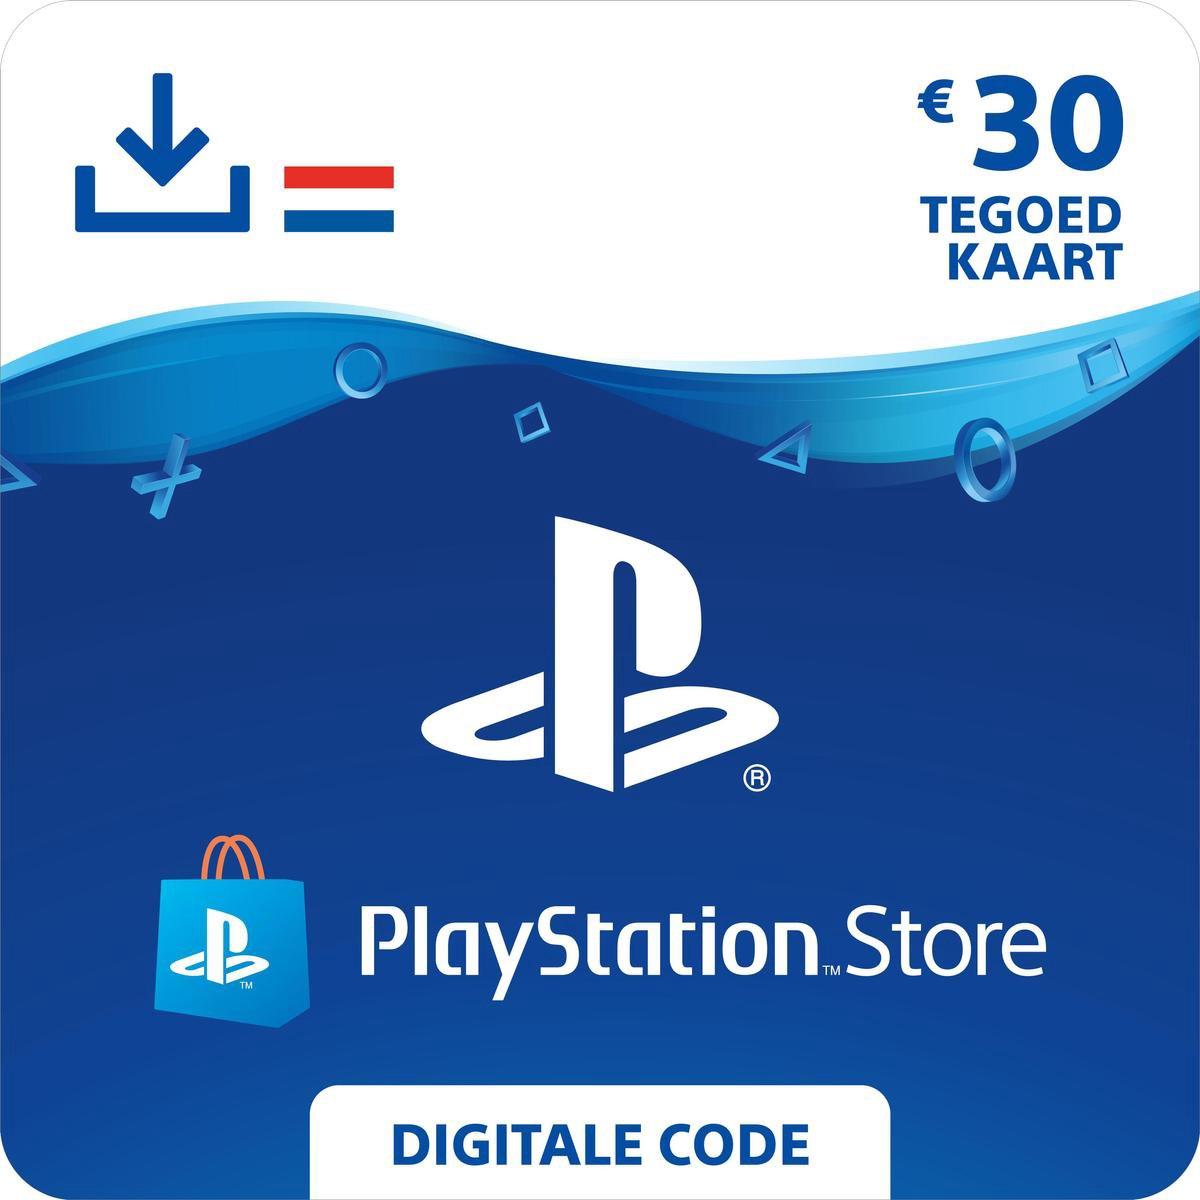 30 euro PlayStation Store tegoed - PSN Playstation Network Kaart (NL)